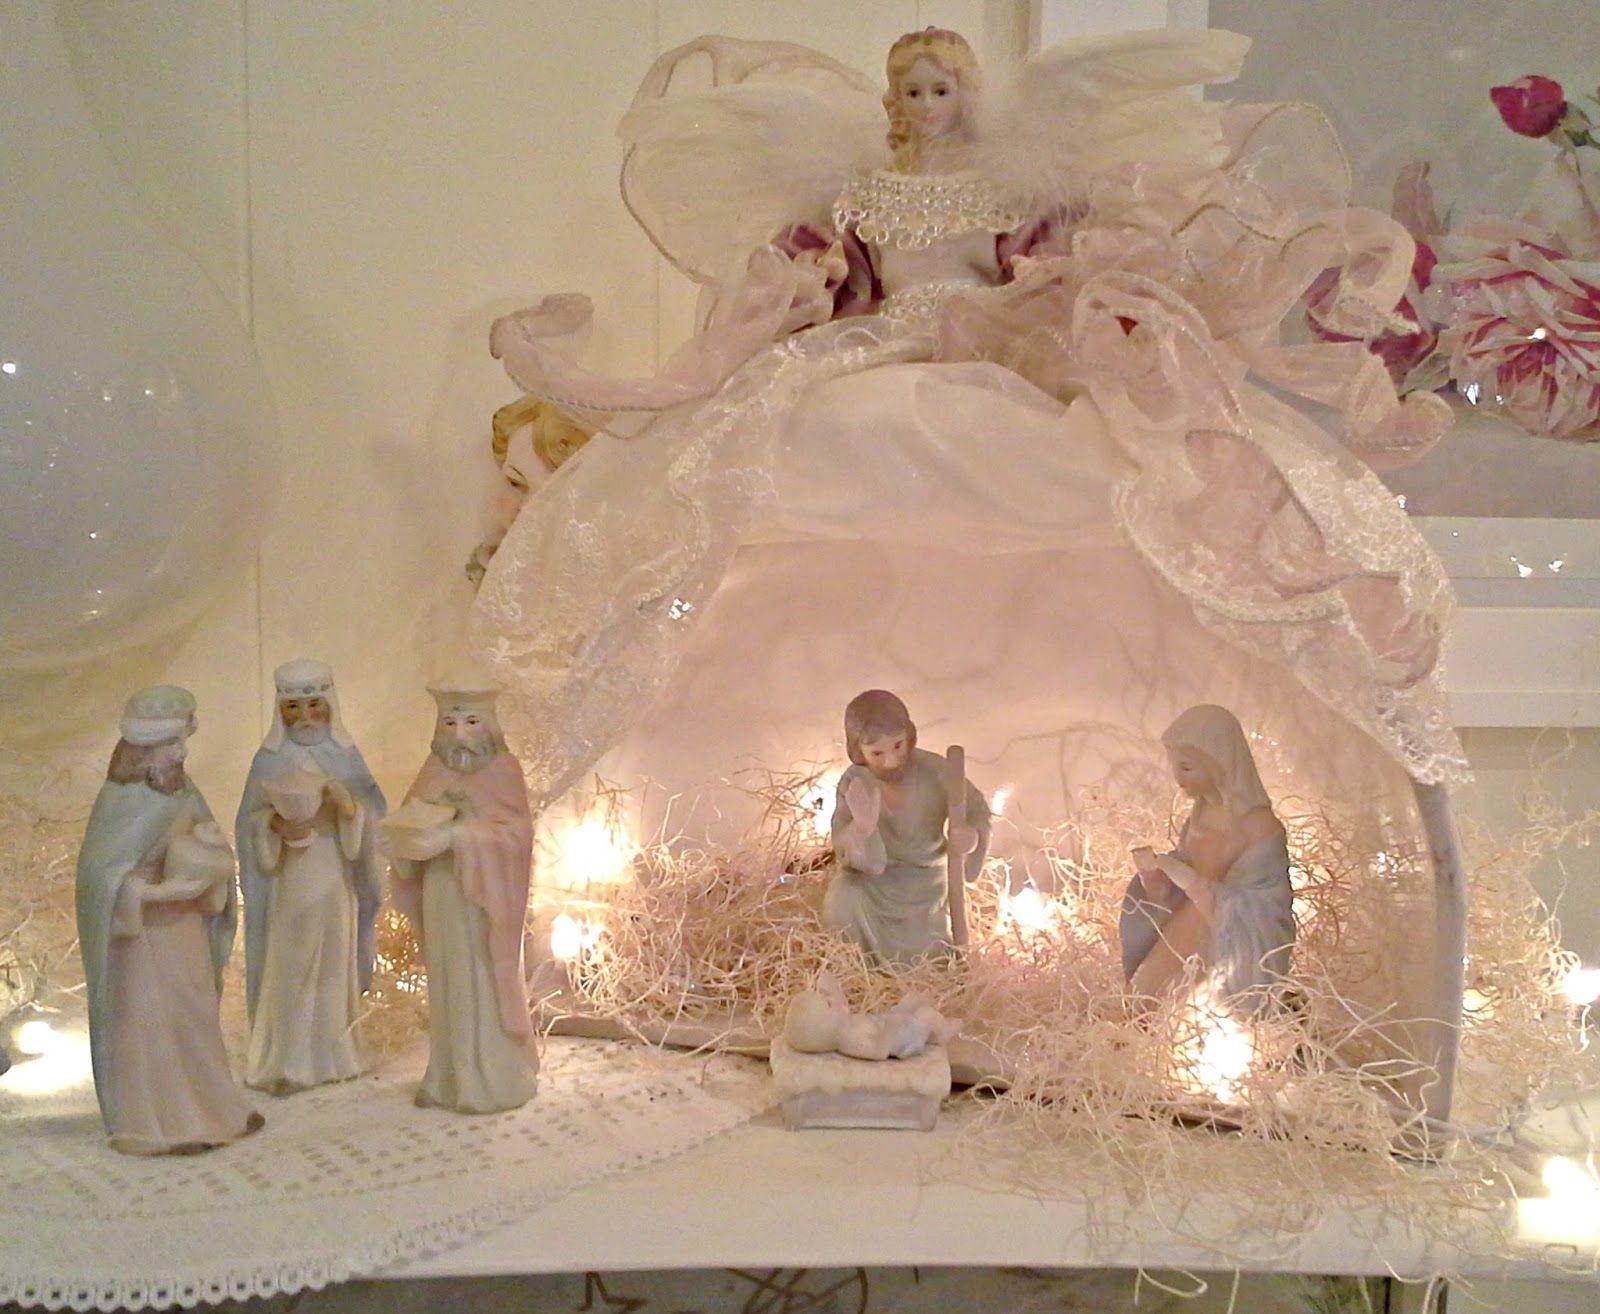 Penny's Vintage Home: Christmas in the Family Room Sneak Peek